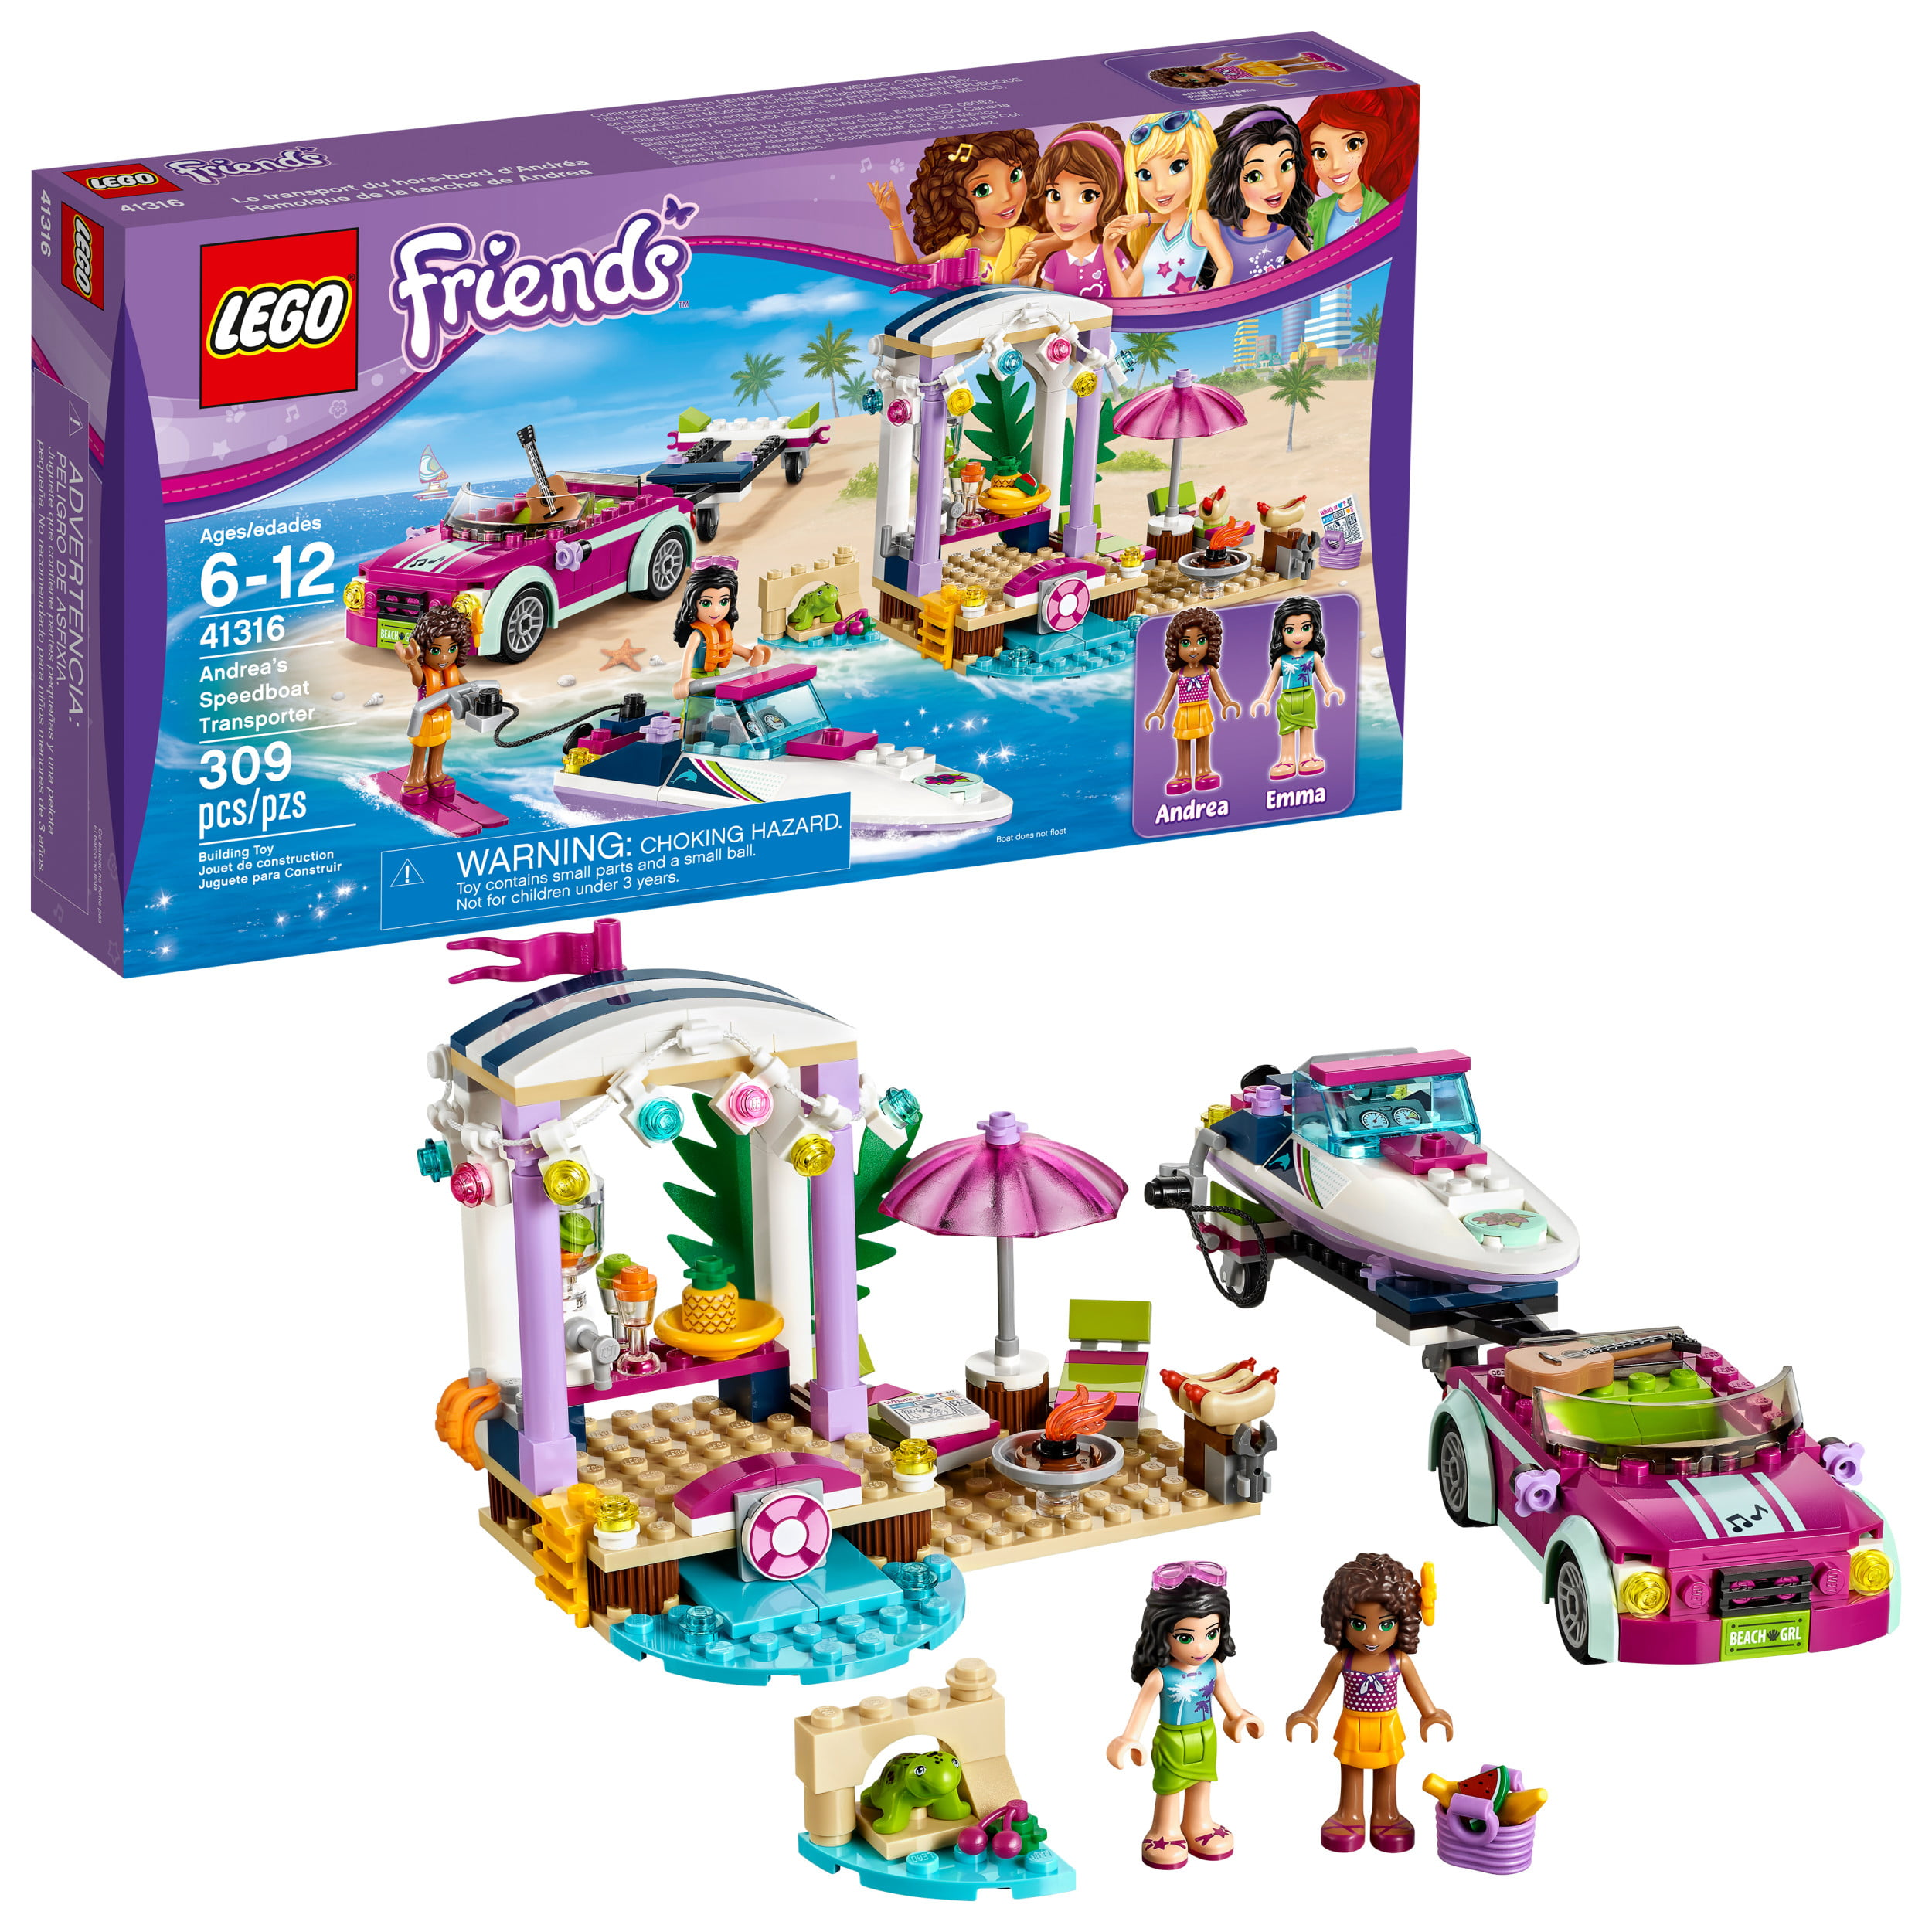 Lego Friends Andreas Speedboat Transporter 41316 309 Pieces